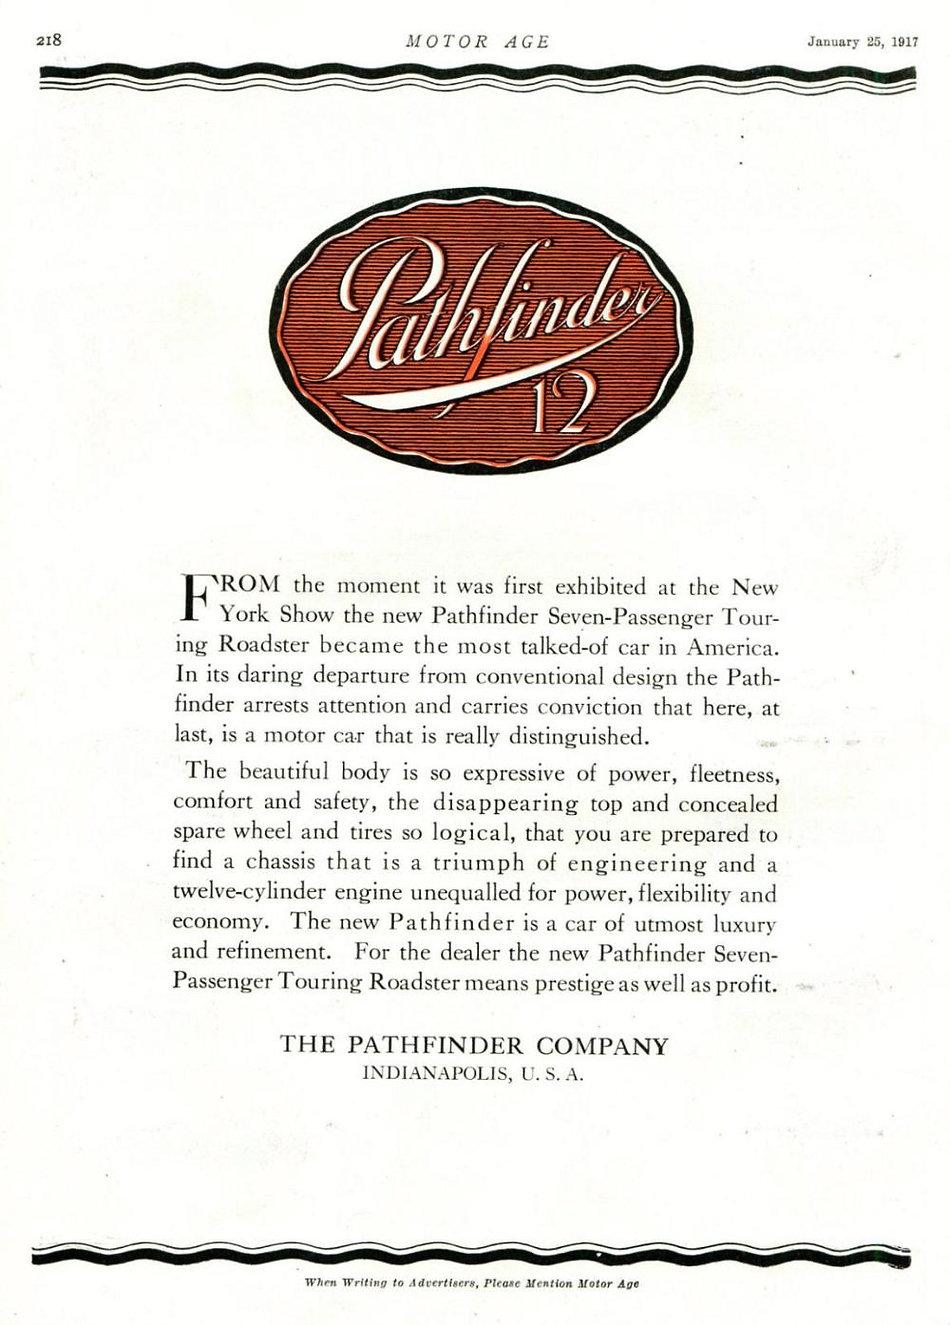 Pathfinder ad 1C (1).jpg